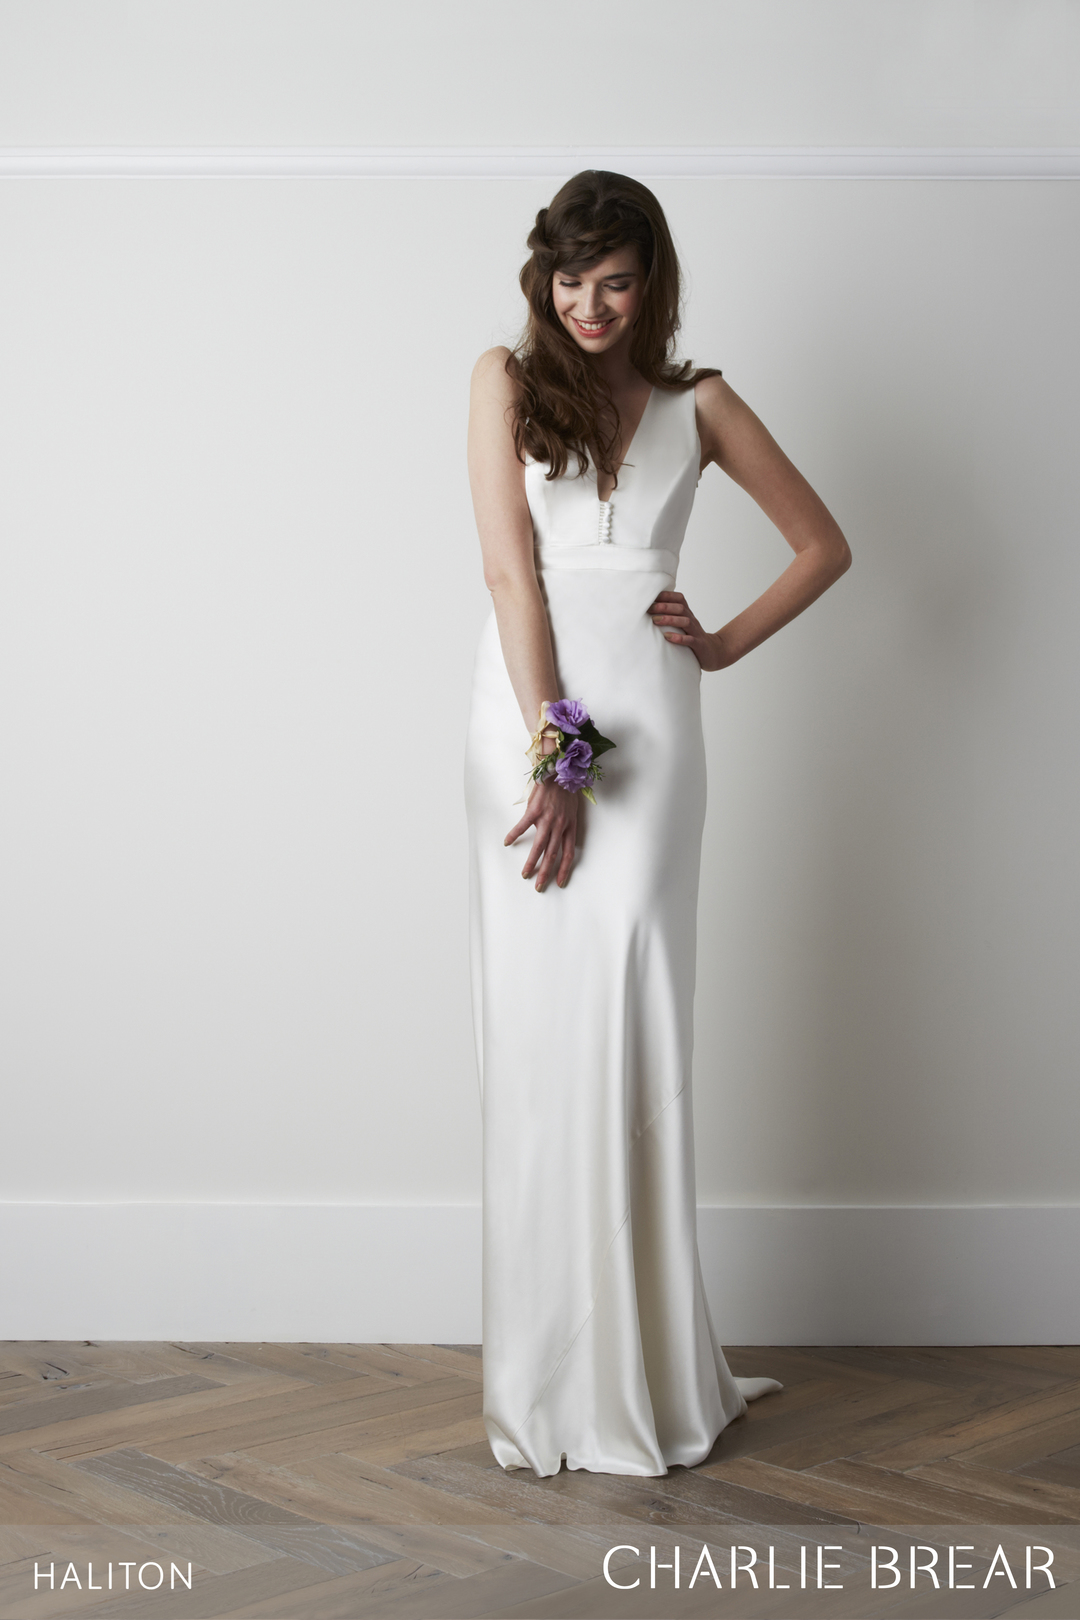 haliton dress photo